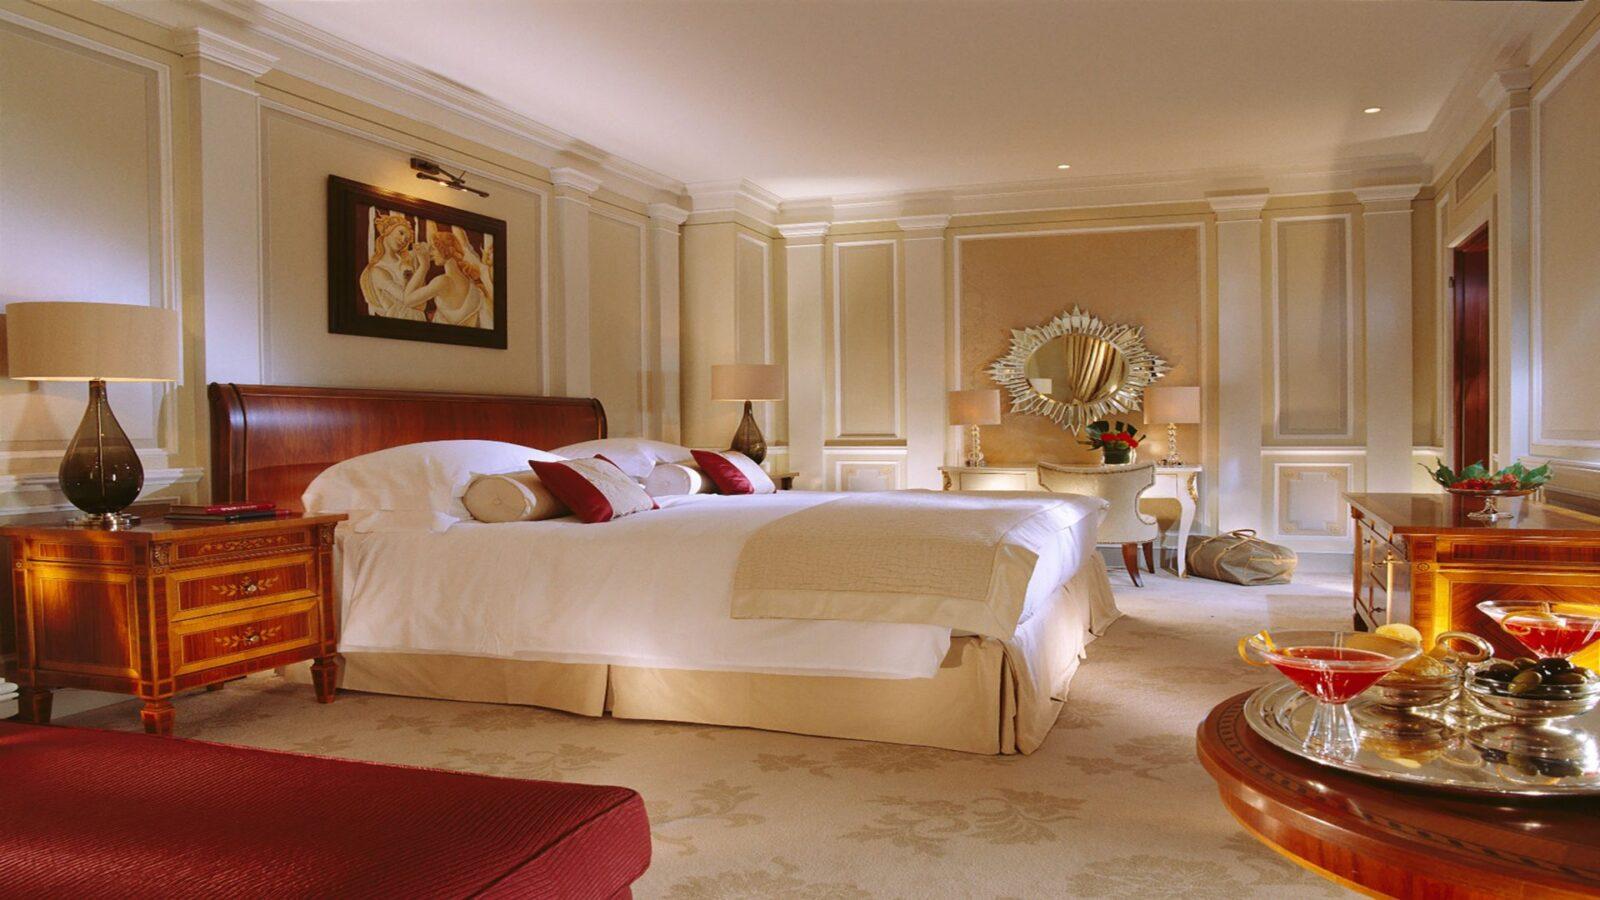 Principe Suite, Hotel Principe di Savoia